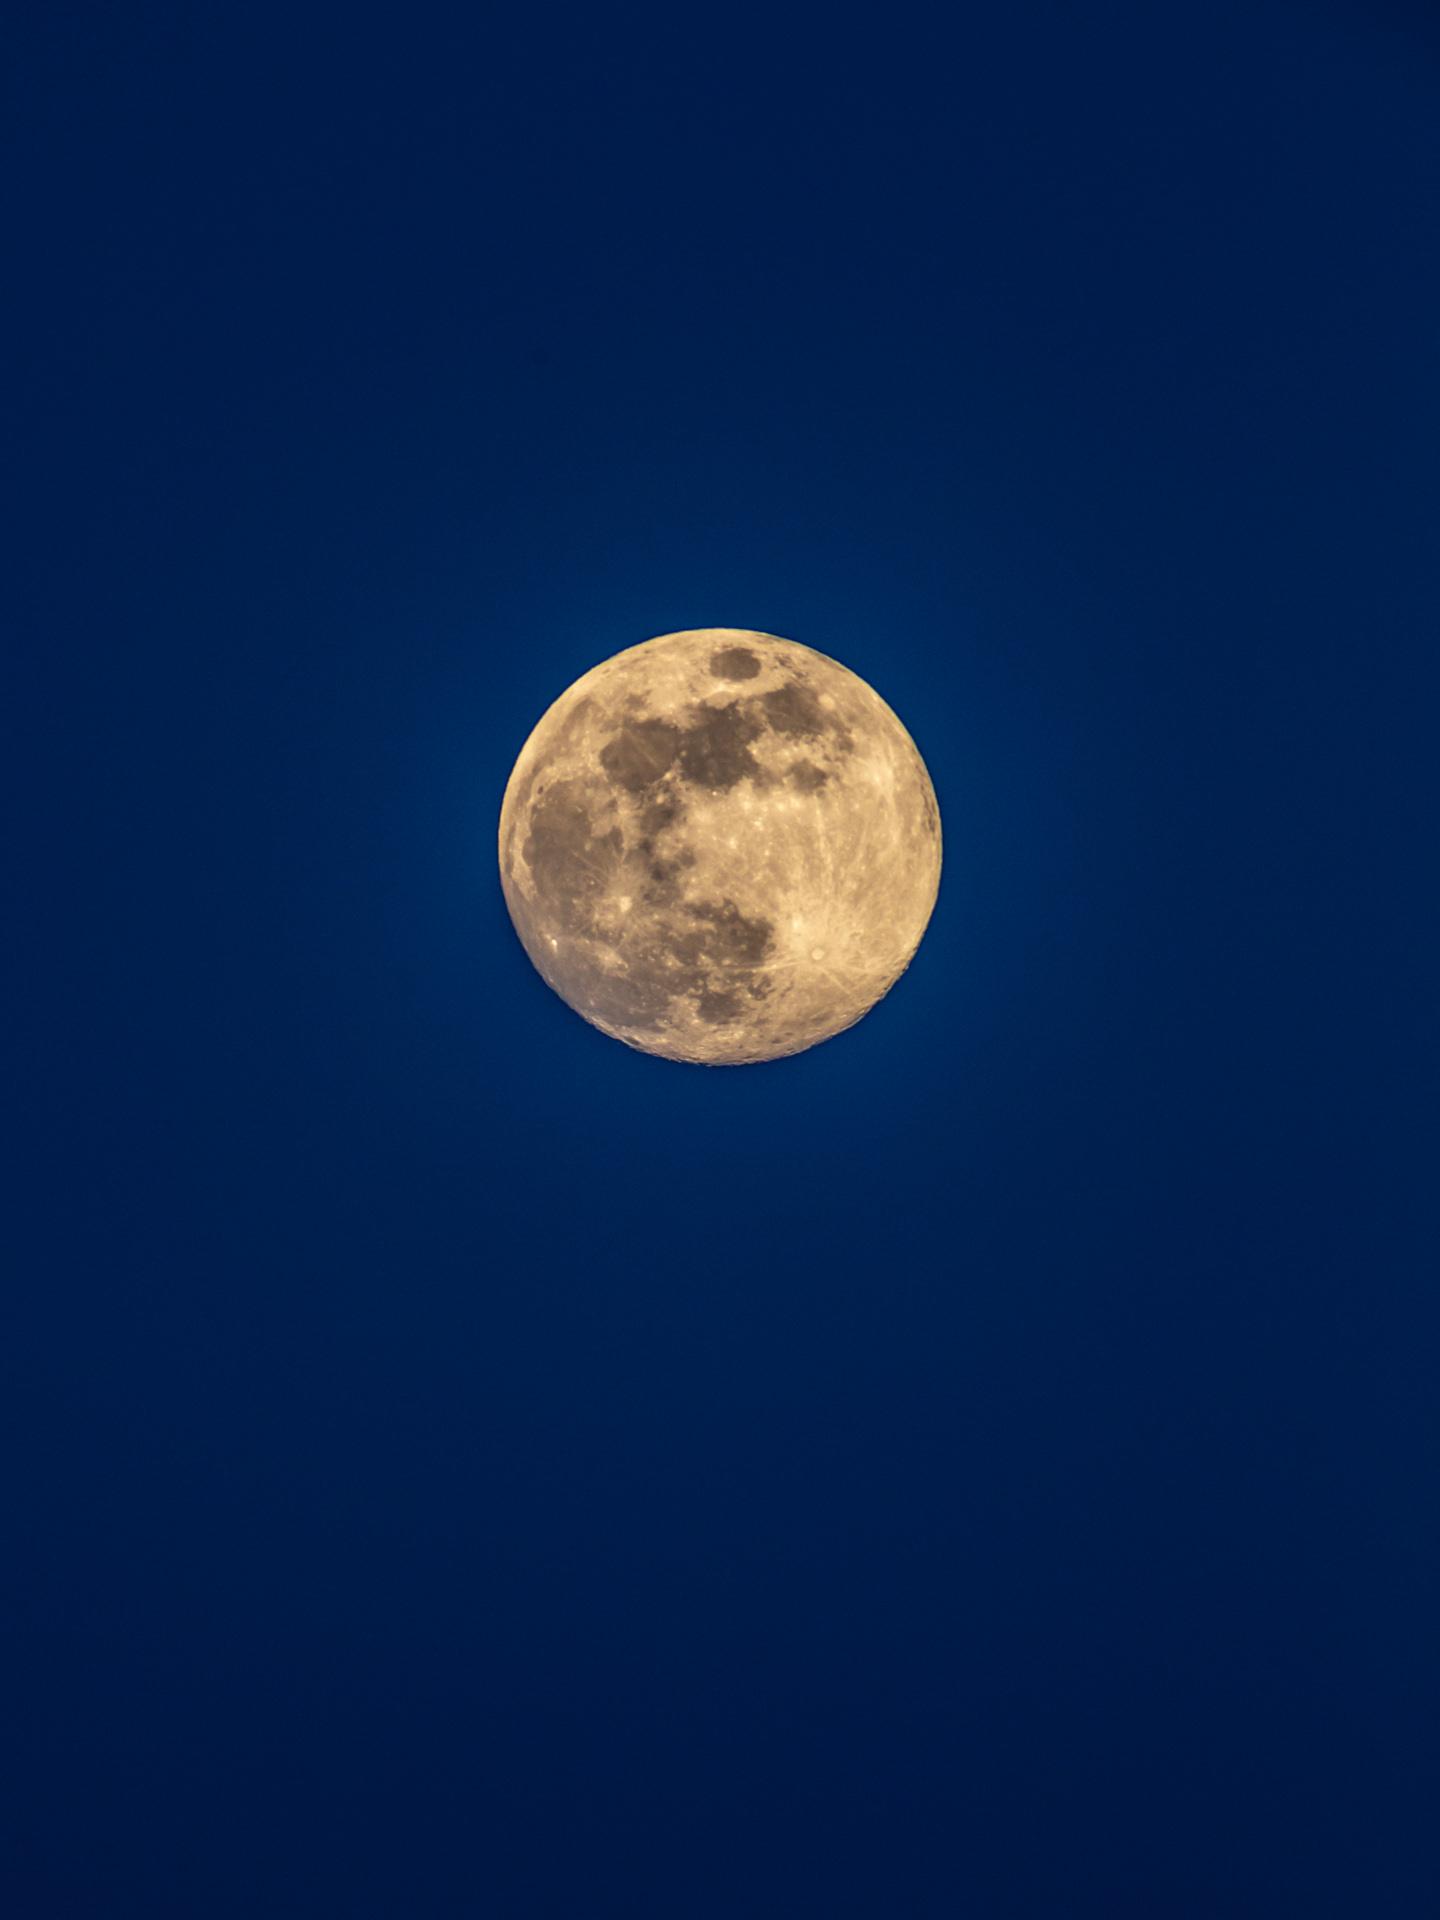 The Moon | 20190517 2015 E:38.96x77.00@84m